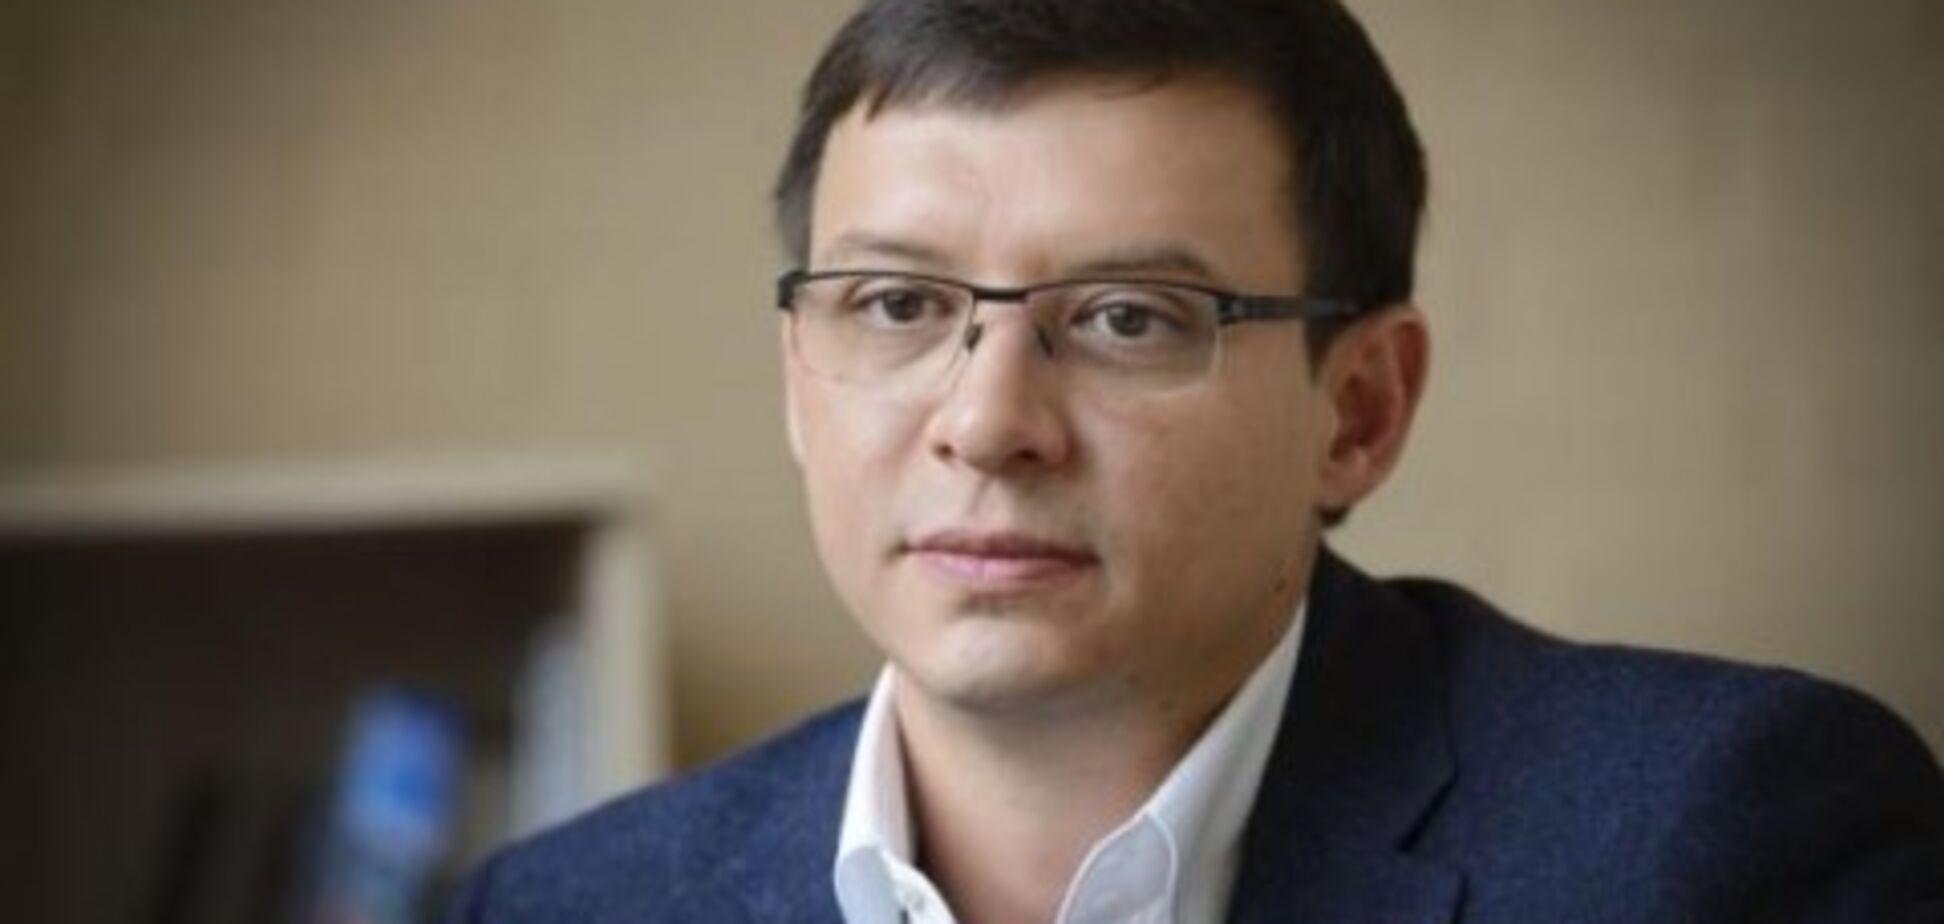 Продажа украинских граждан